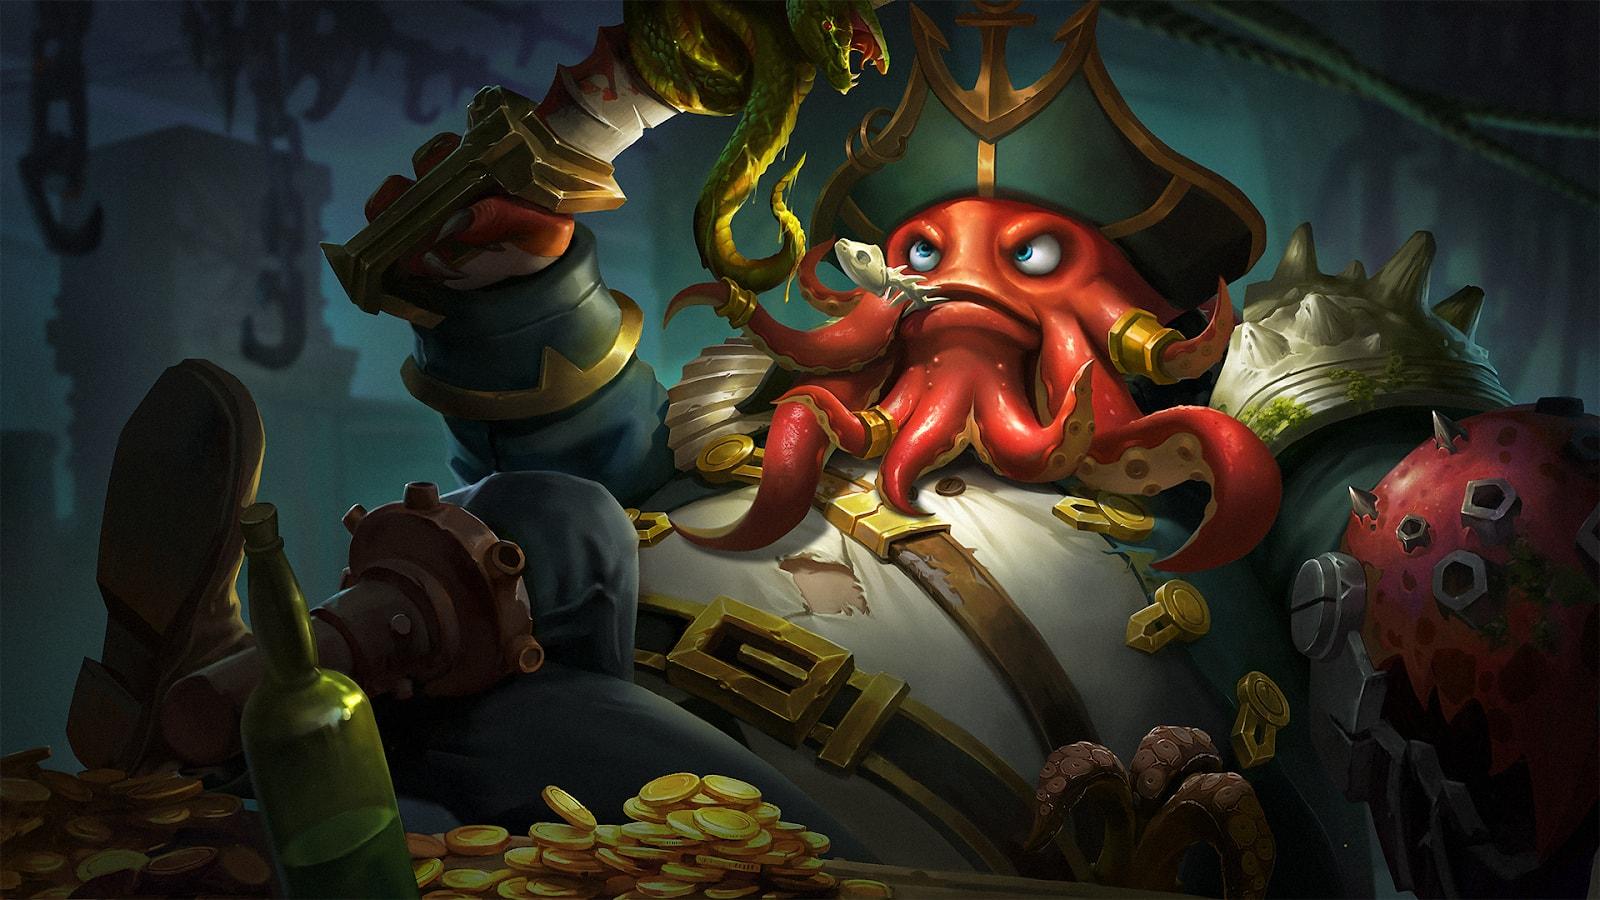 Wallpaper Bane Lord of Heptaseas Mobile Legends Full HD for PC